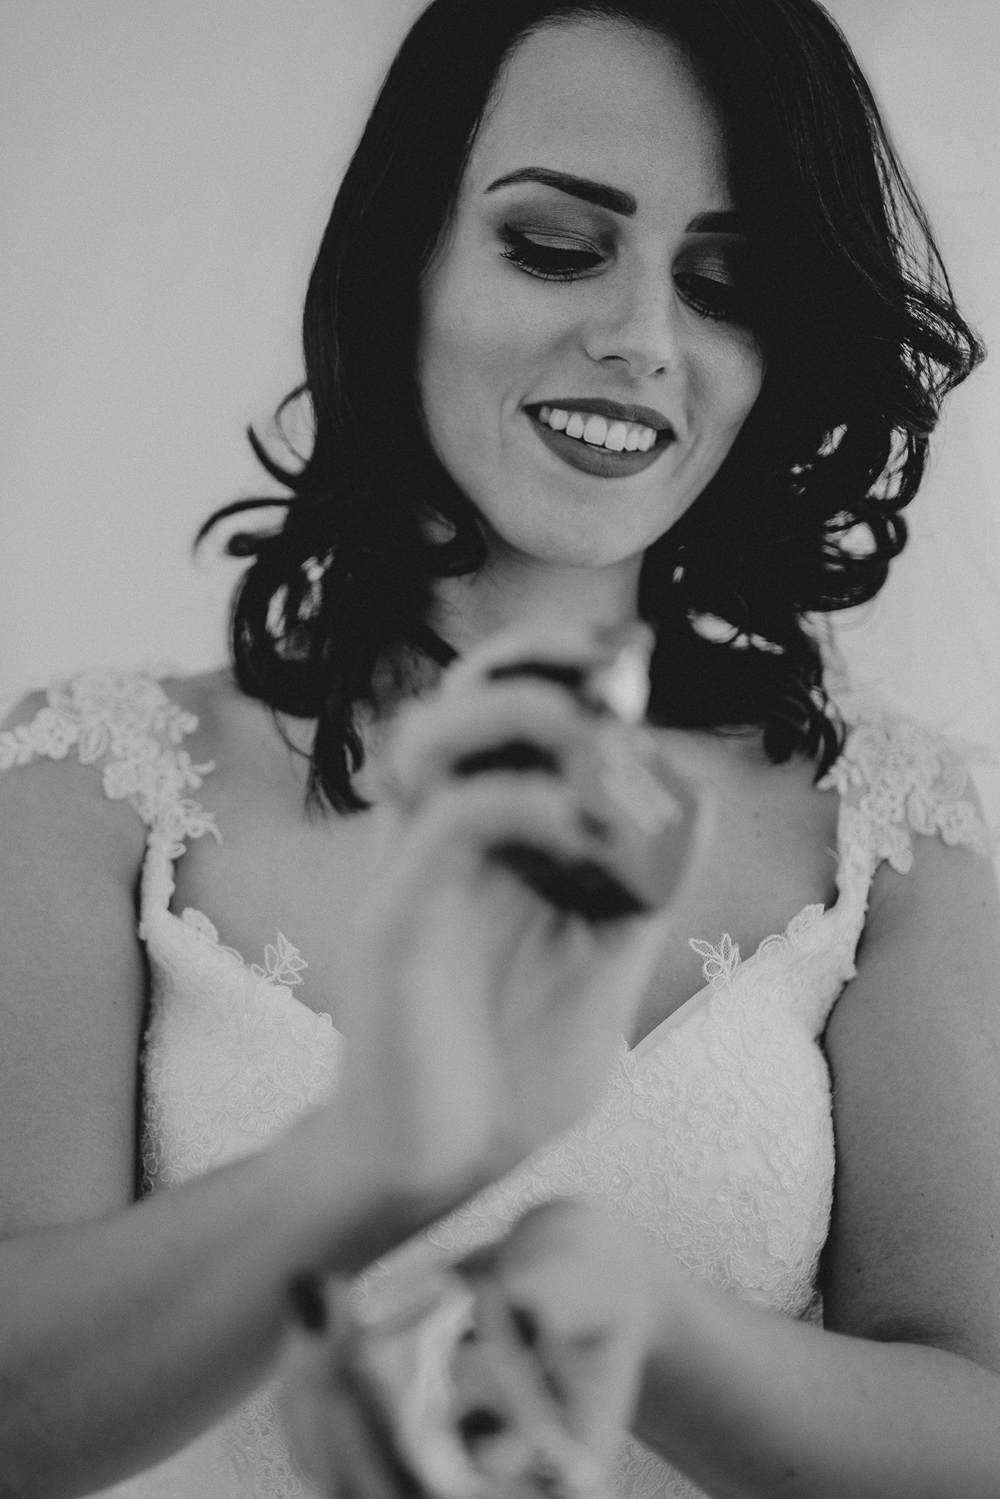 bruidsfotograaf mark hadden uit amsterdam bruid portret